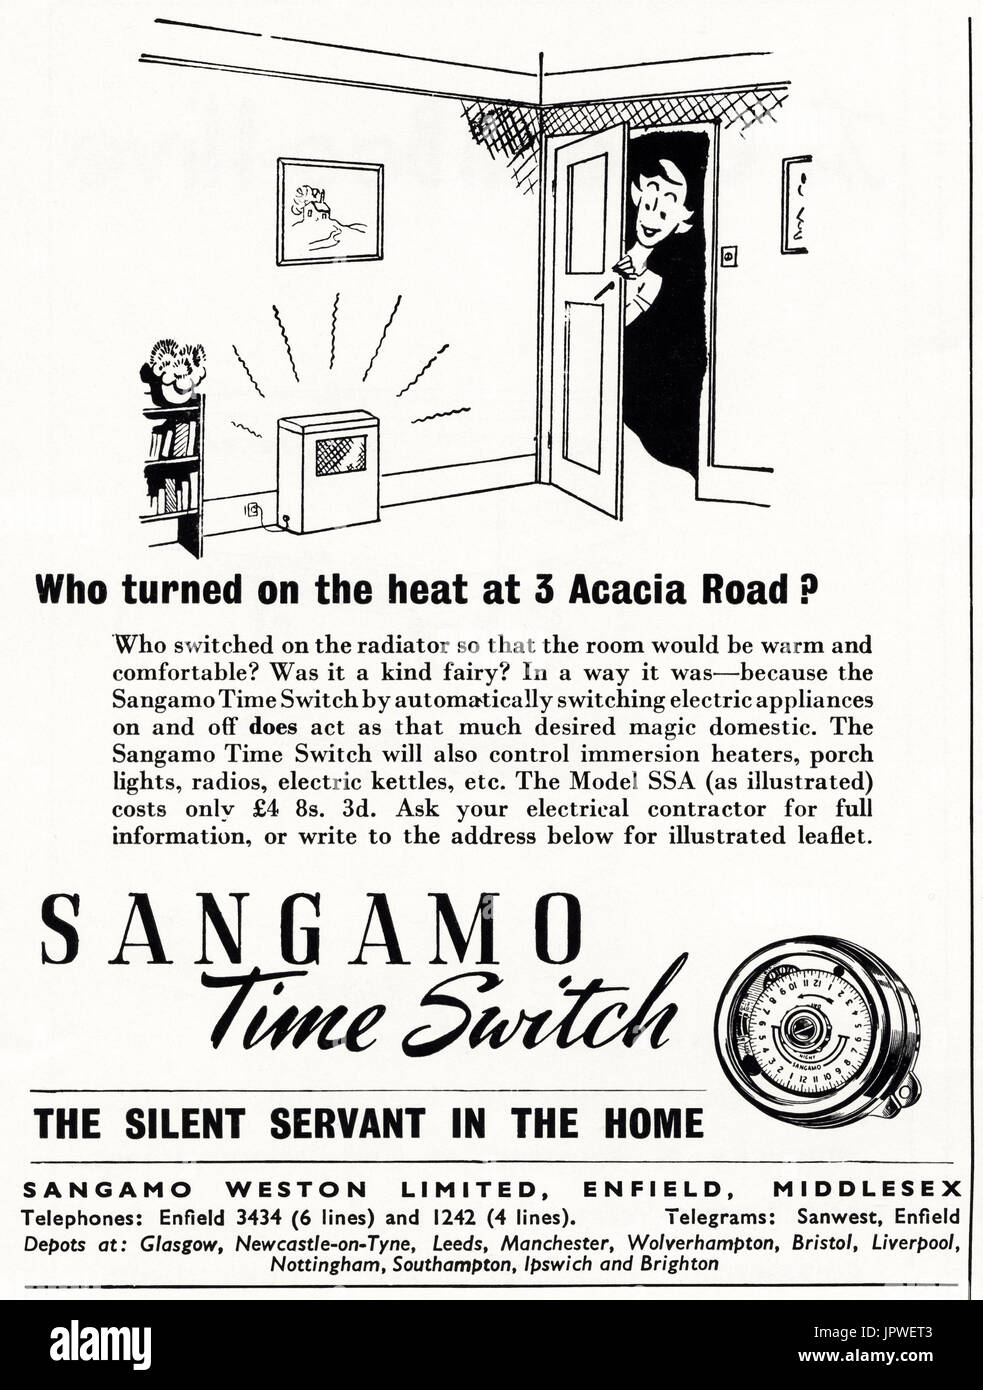 Sangamo Electric Company Nj